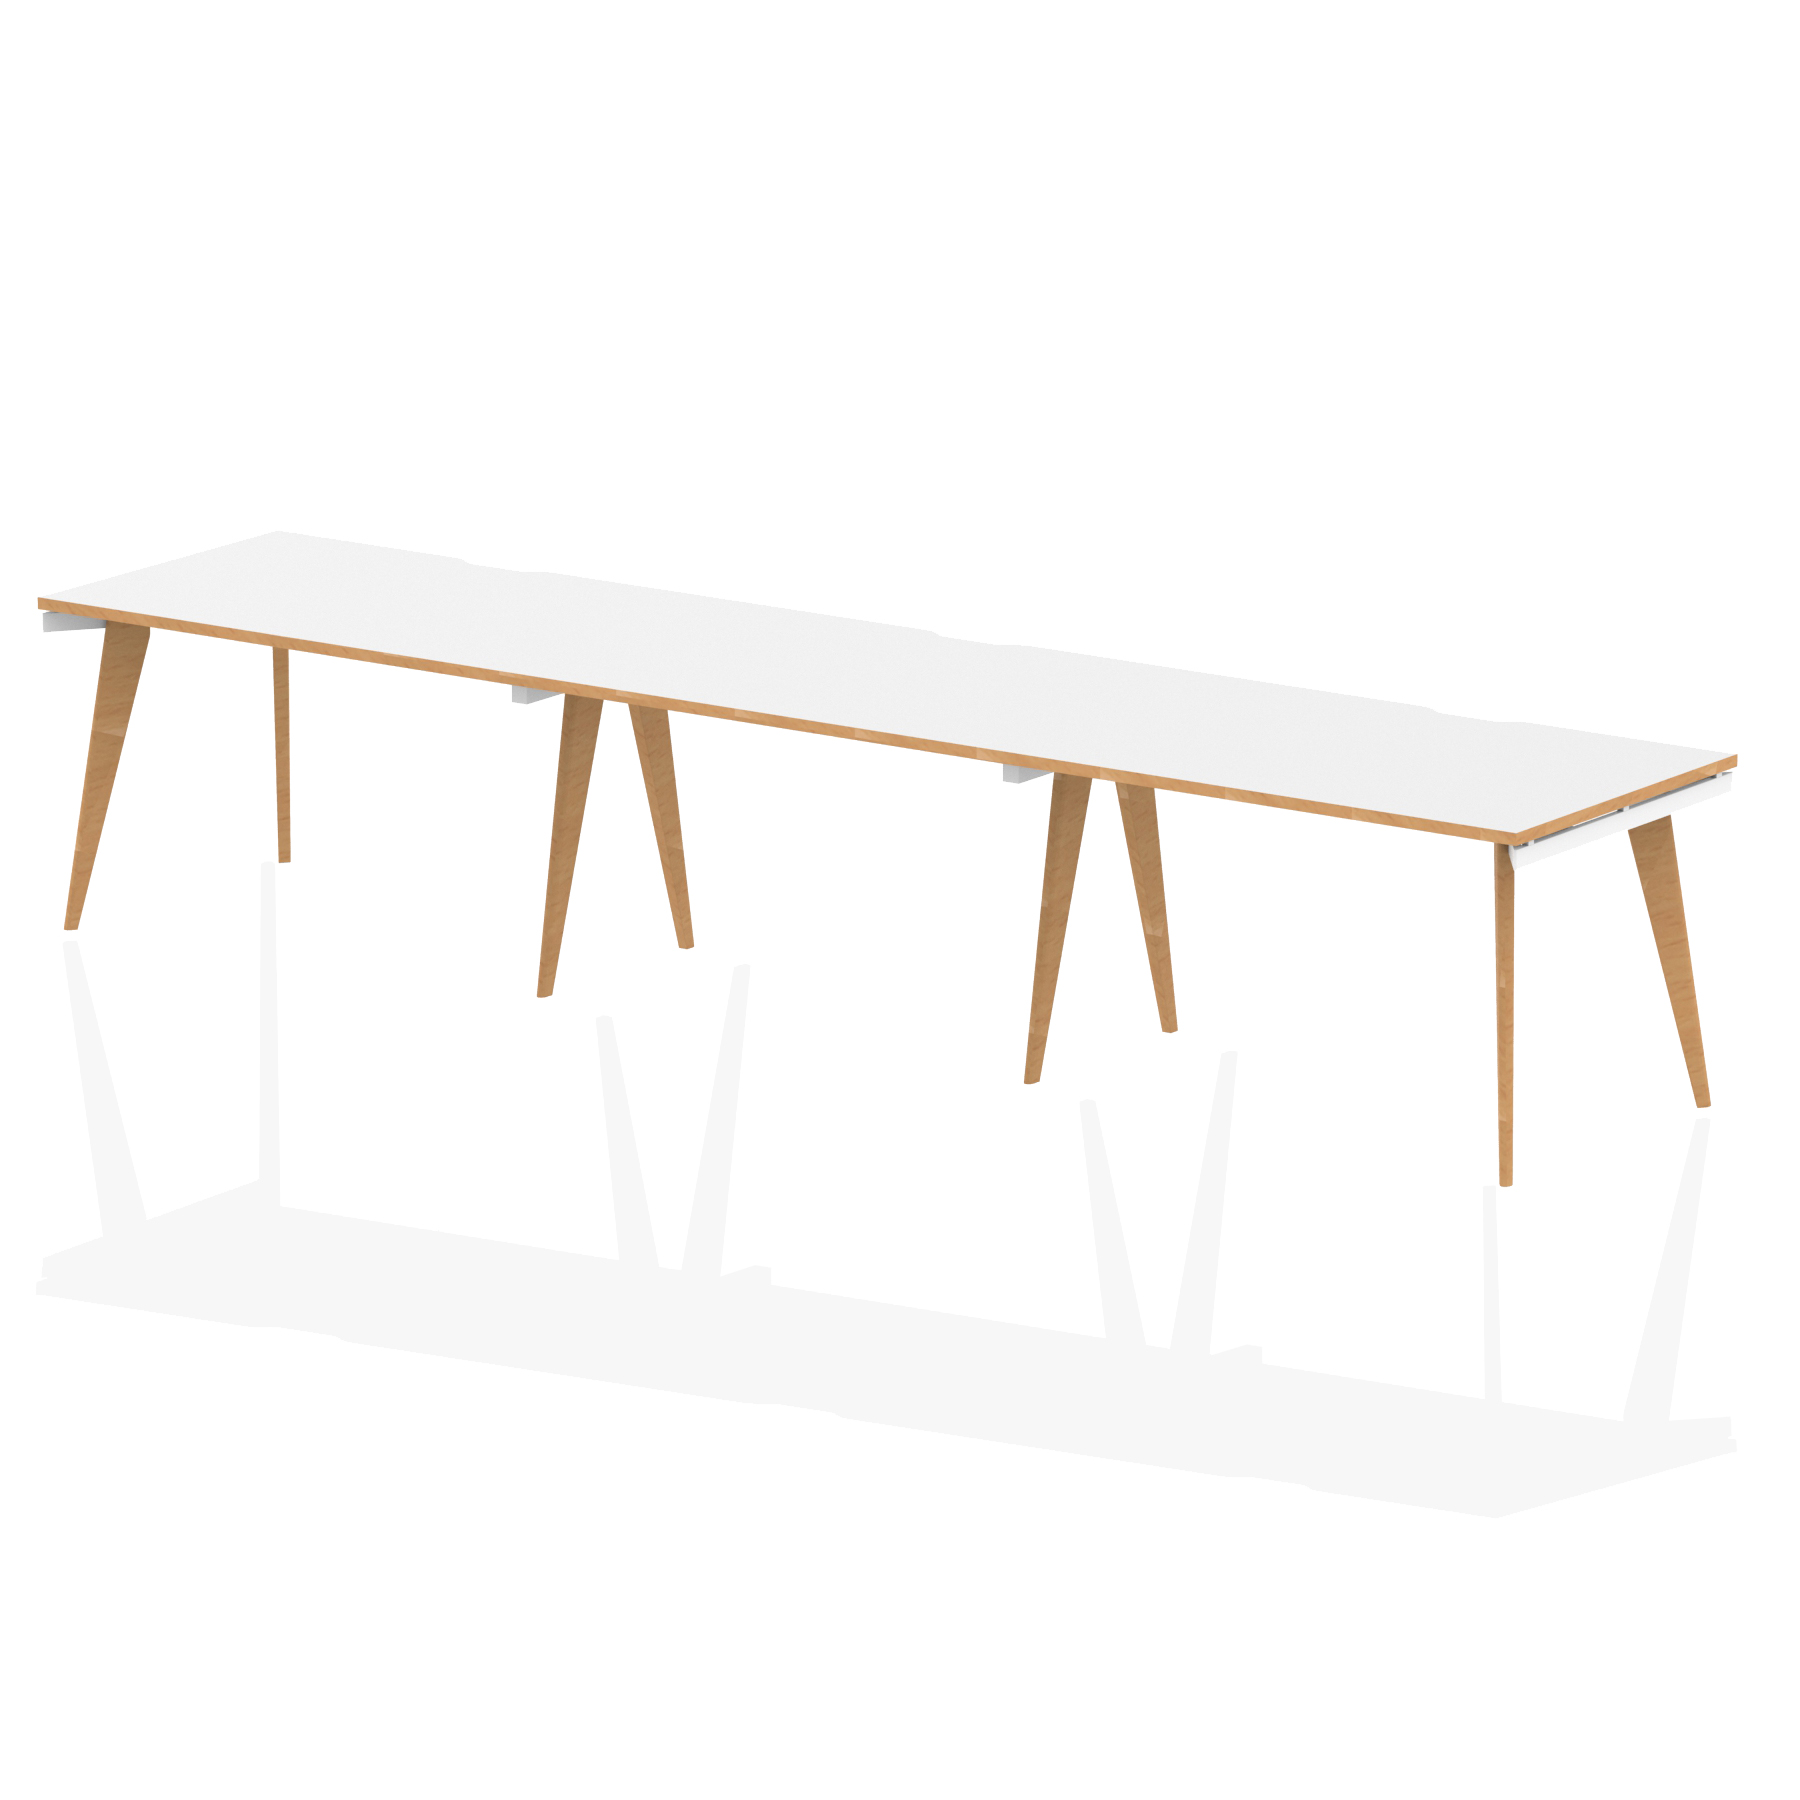 Oslo Single White Frame Wooden Leg Bench Desk 1200 White With Natural Wood Edge (3 Pod)